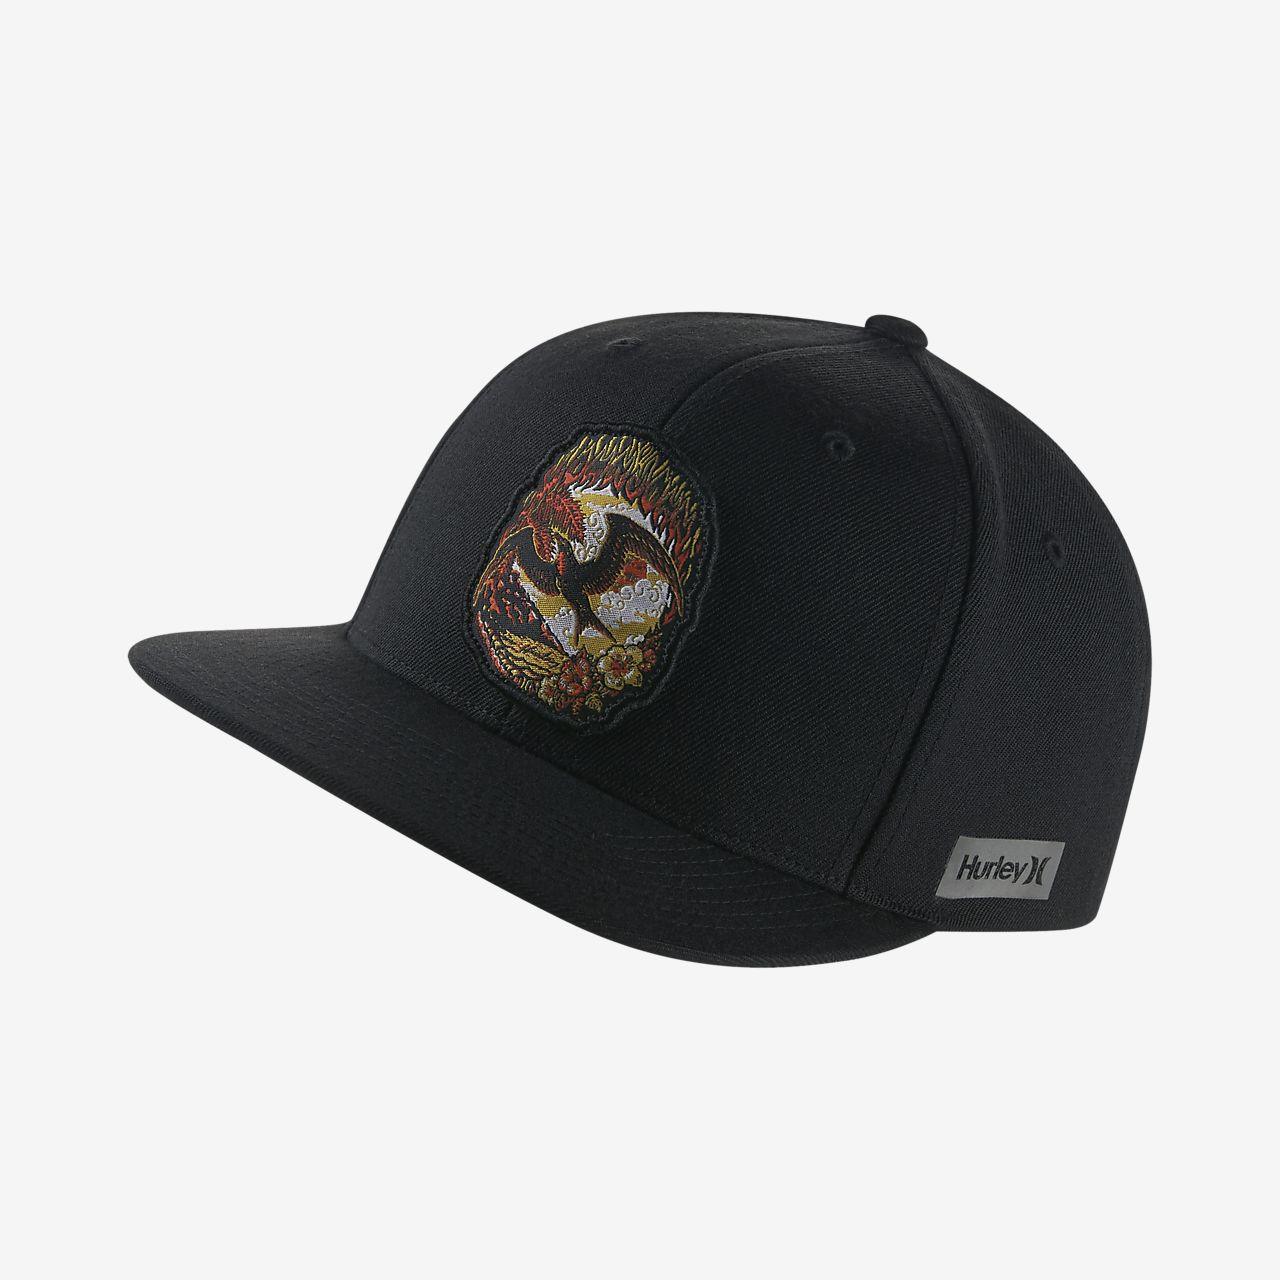 f041c385a09fde Hurley Team John John Men s Hat. Nike.com HR